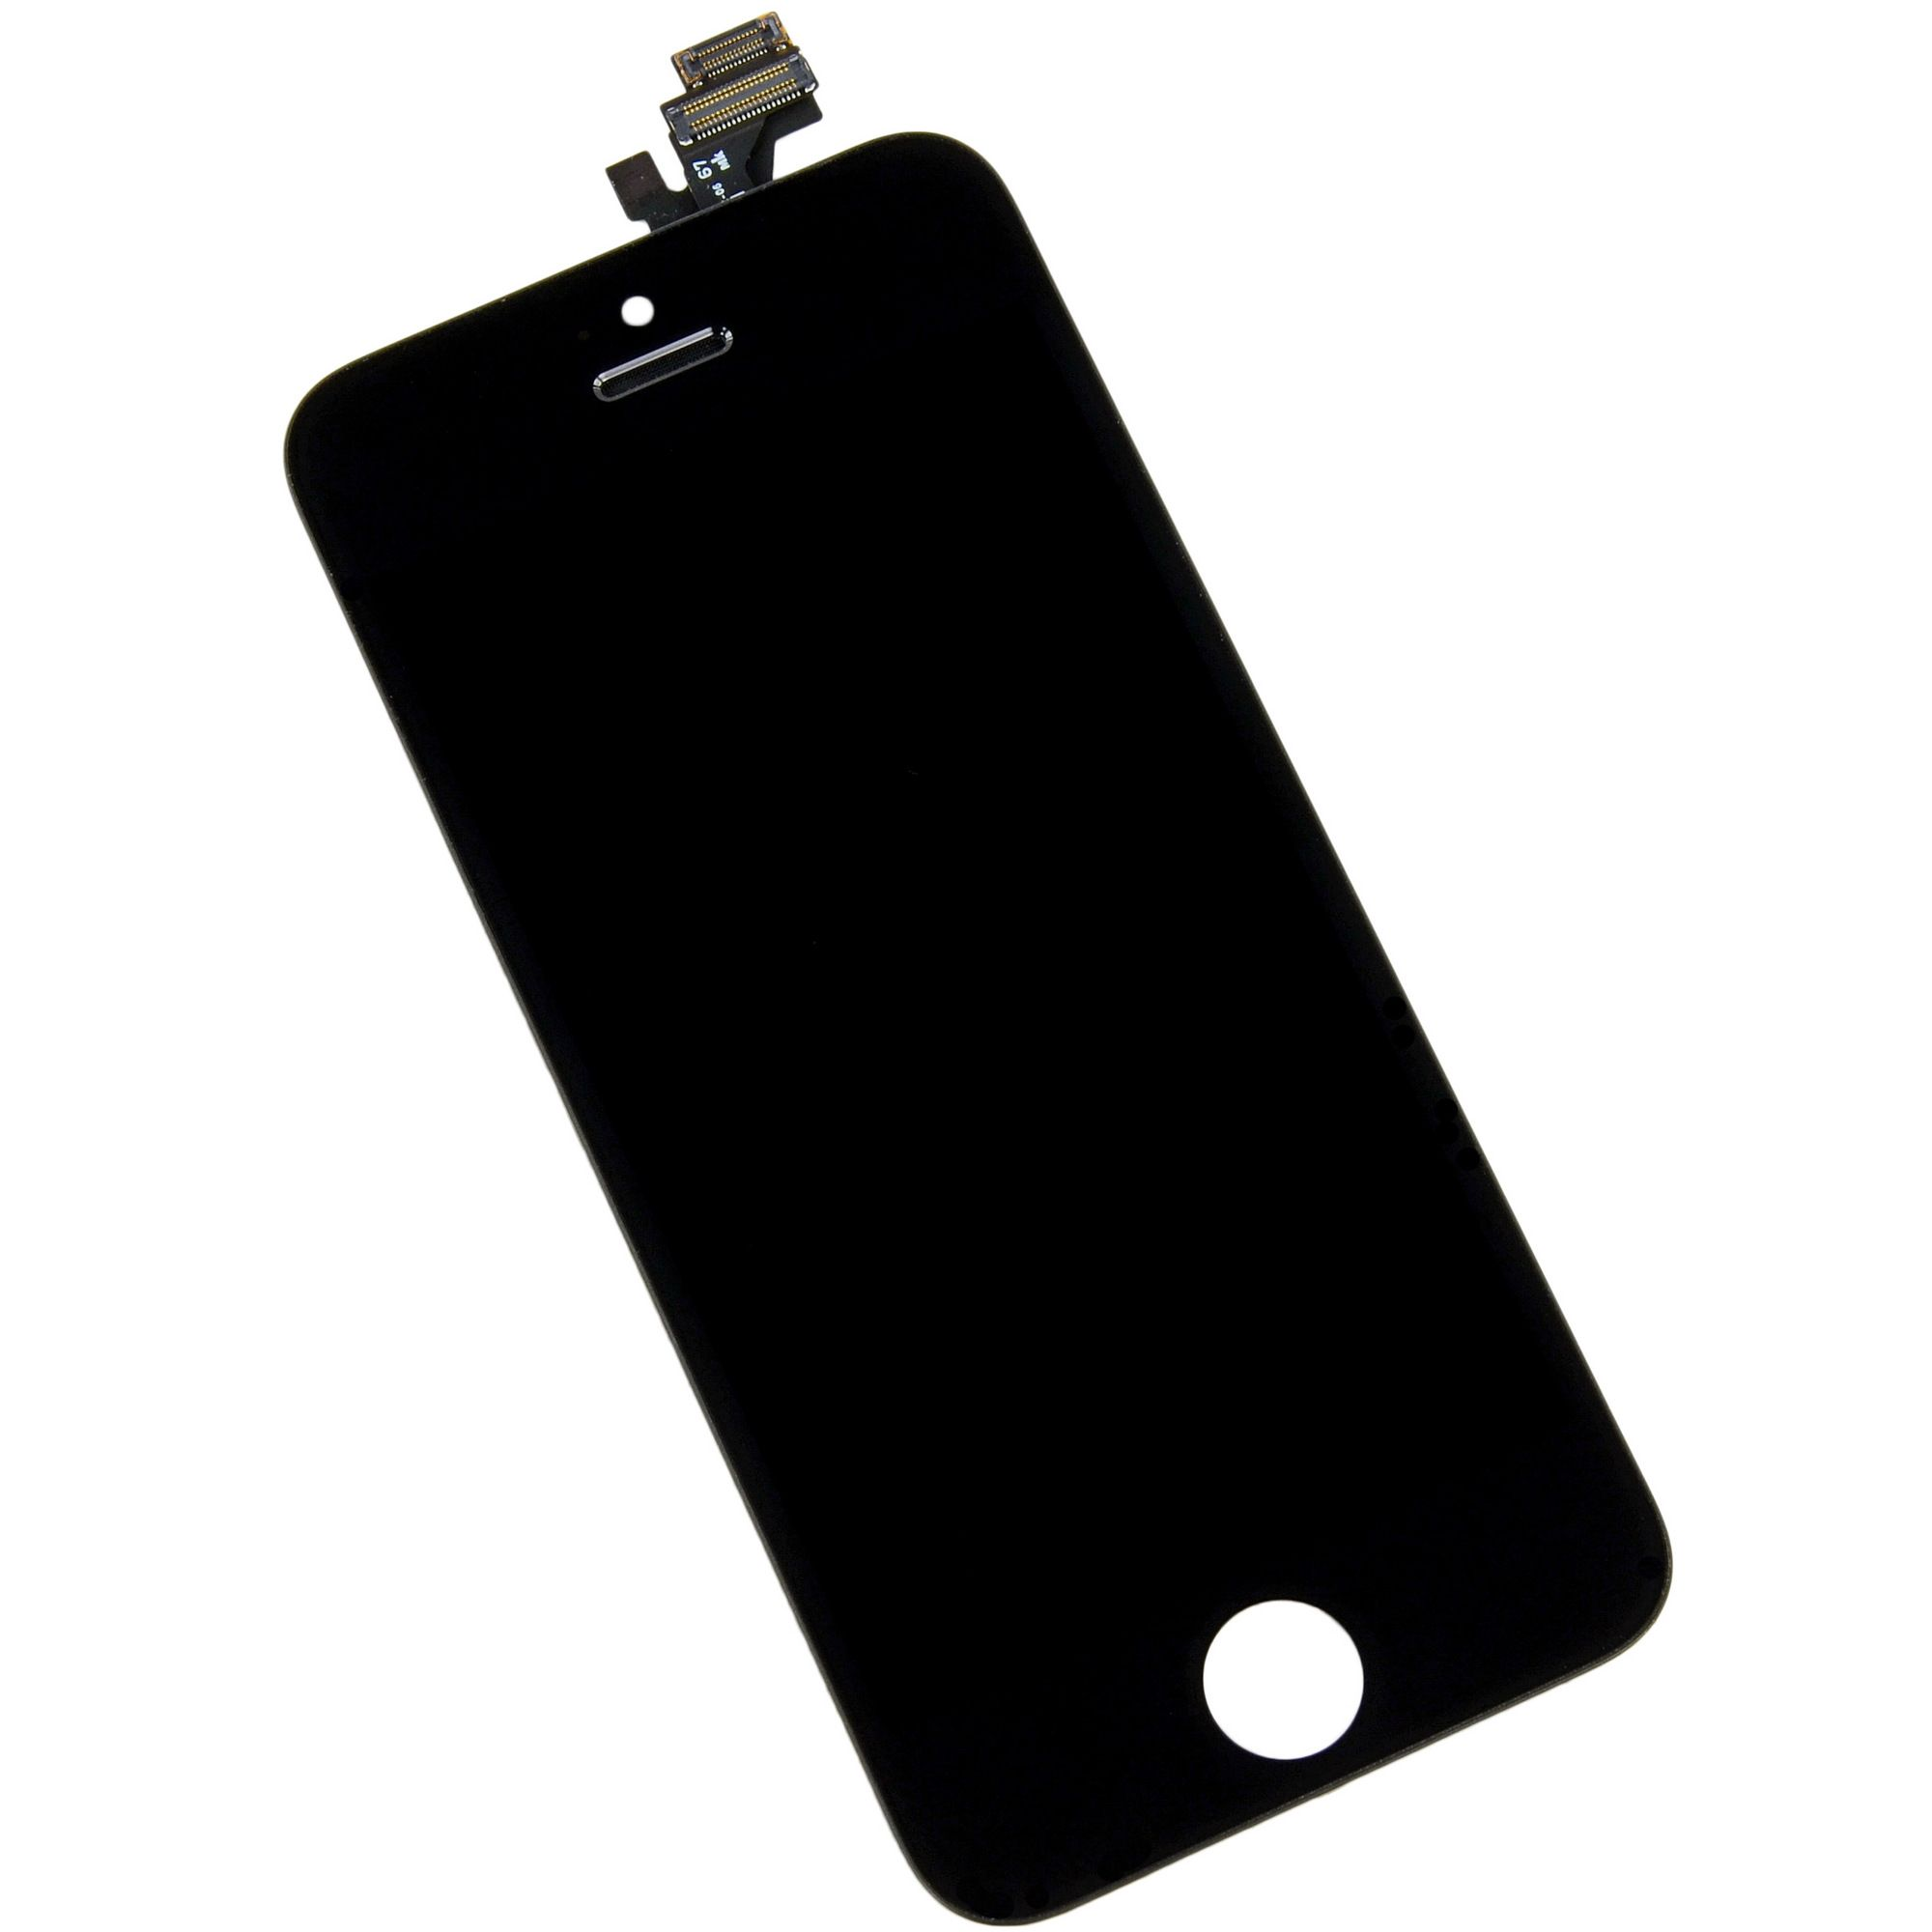 Tela Touch Screen Display LCD Apple iPhone 5 Original